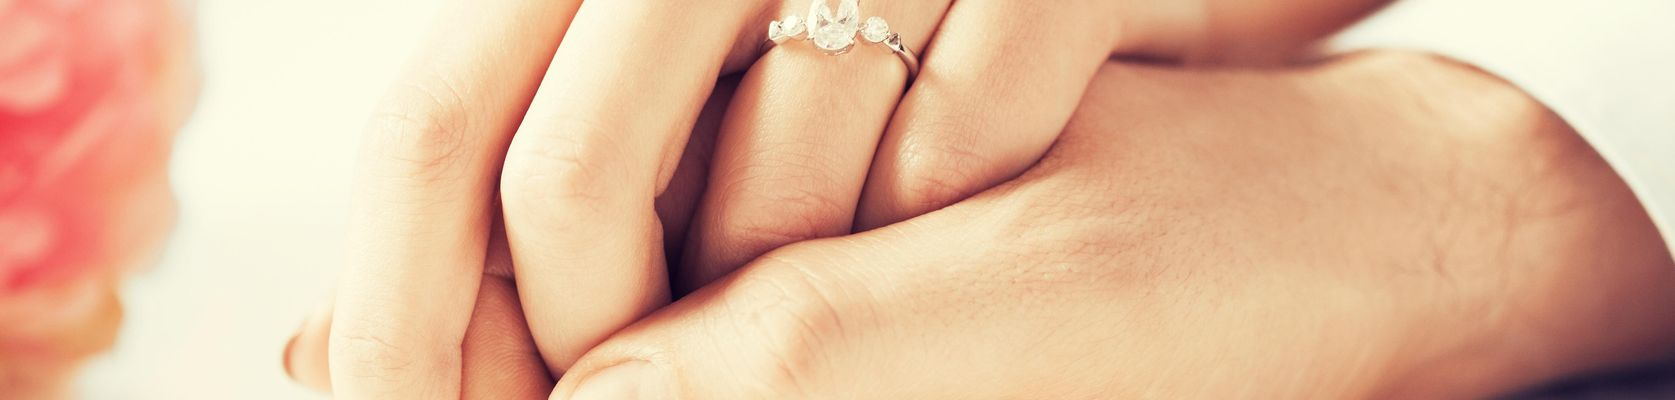 Bride-to-be, Verlobung, verloben, Verlobungsring